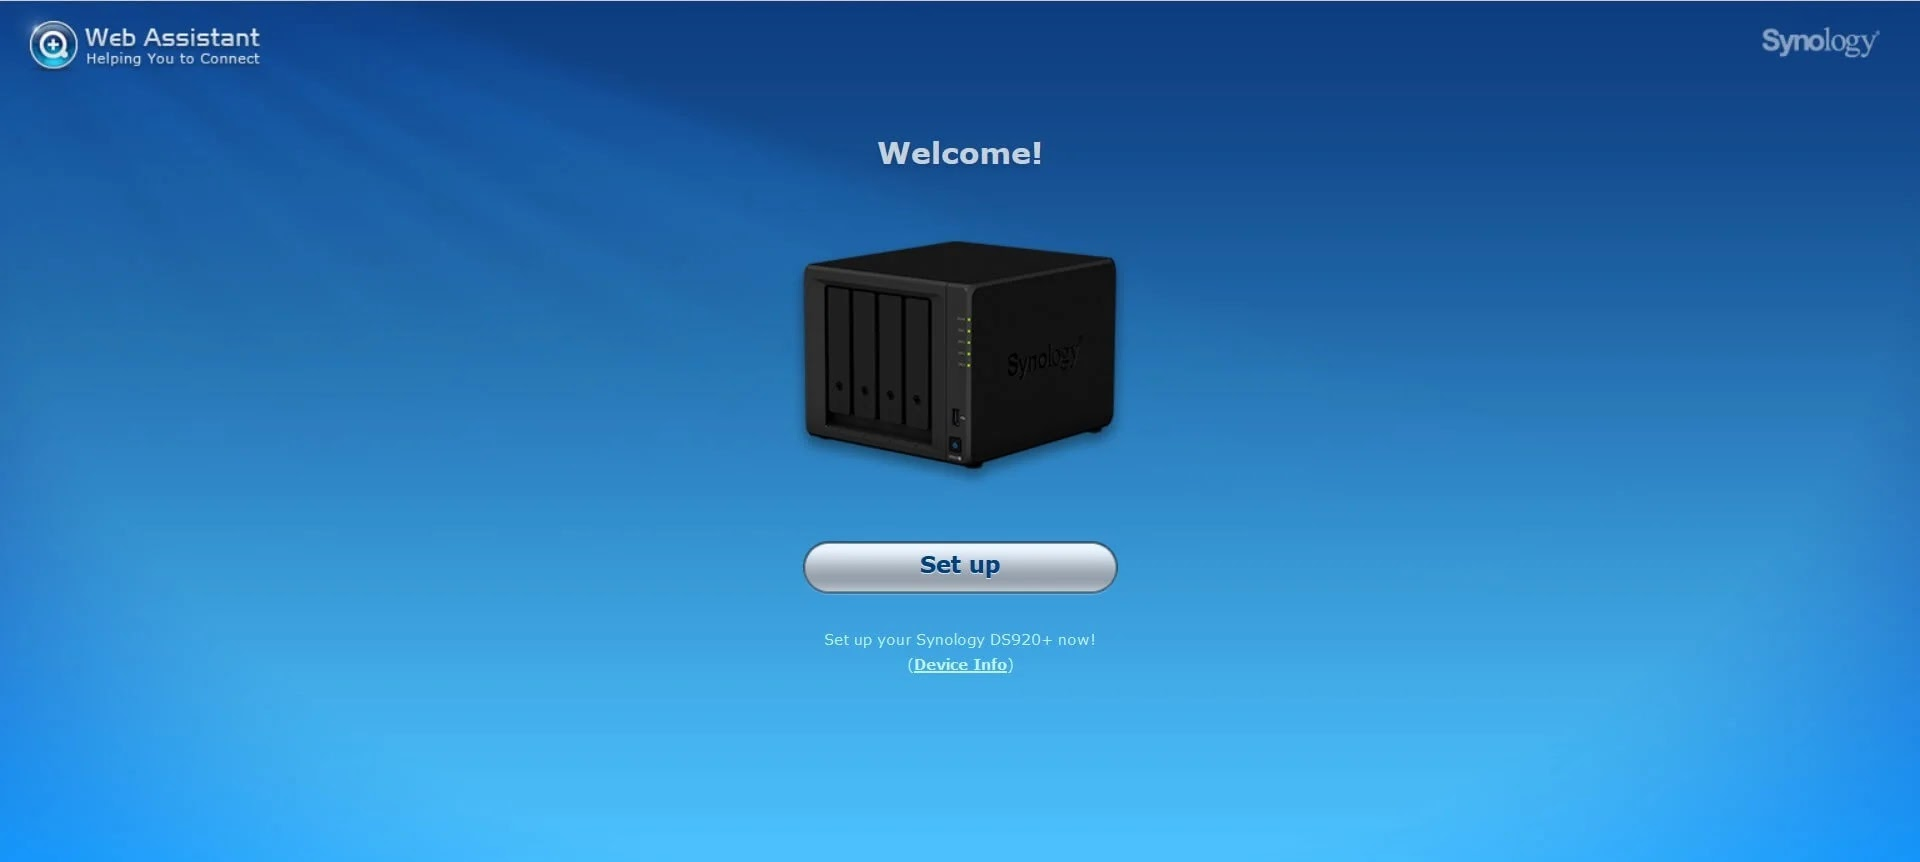 Synology DiskStation DS920+ Web Assistant